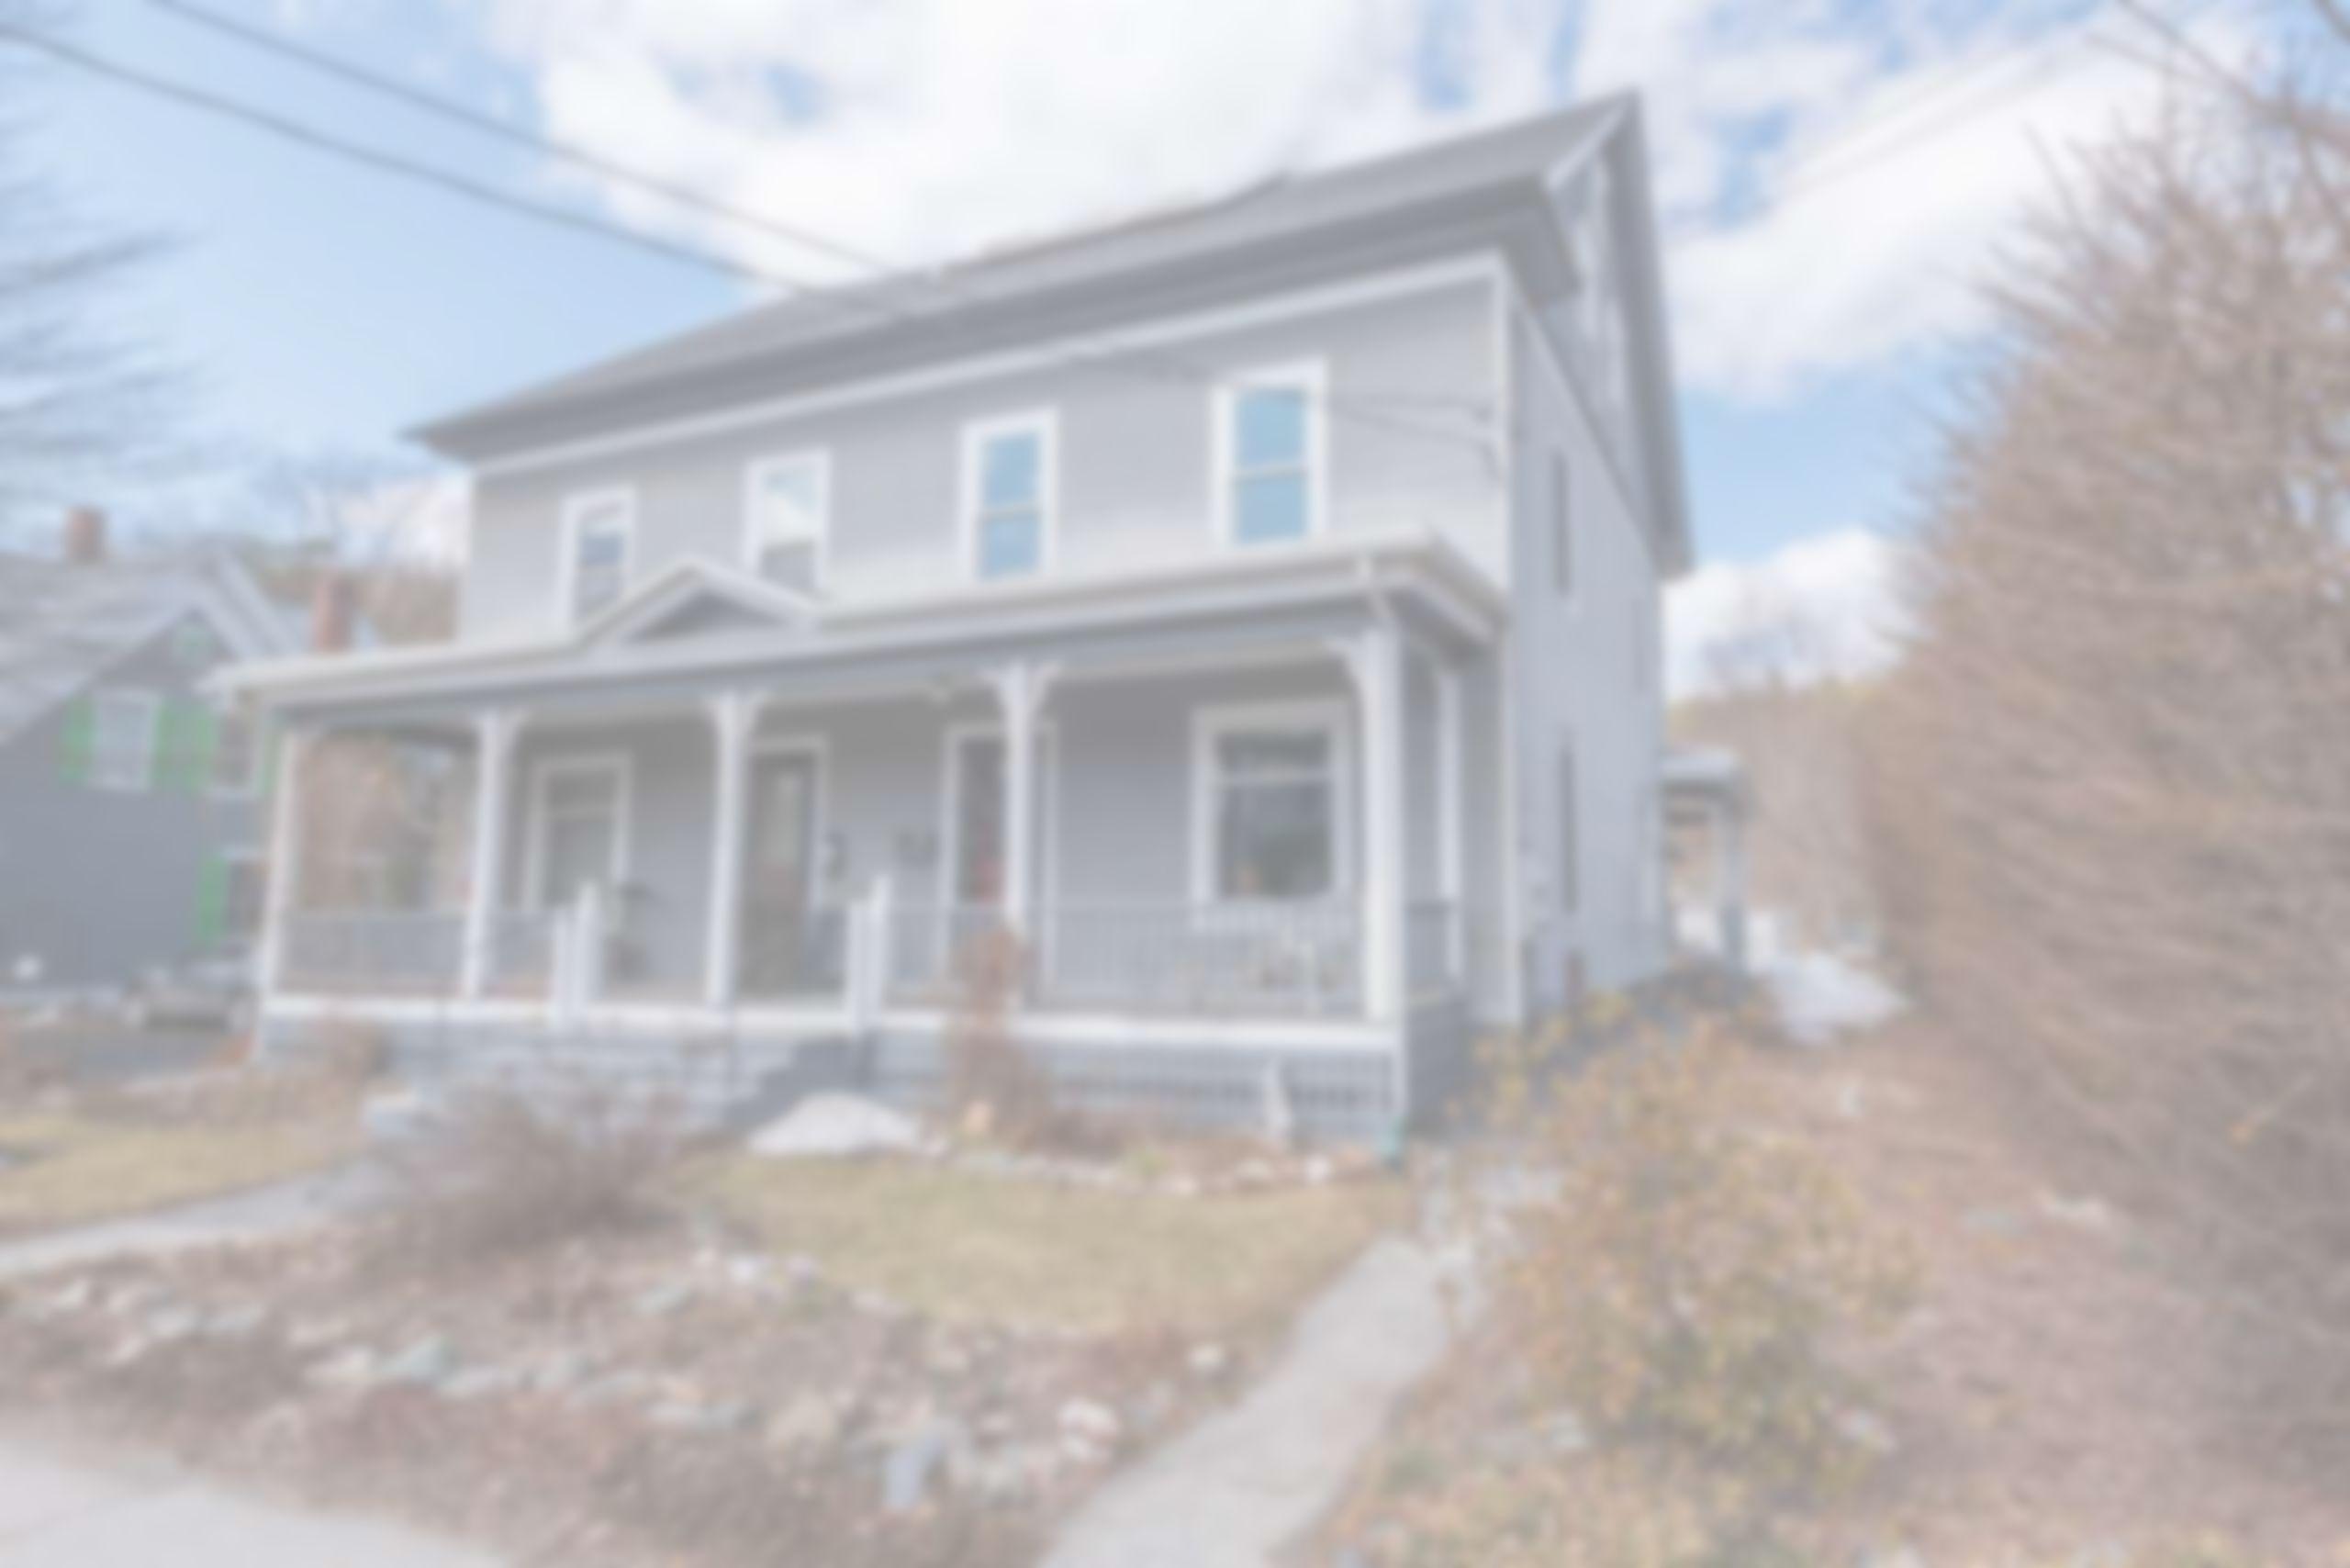 Single family Houses in Montpelier $200,000 – $300,000